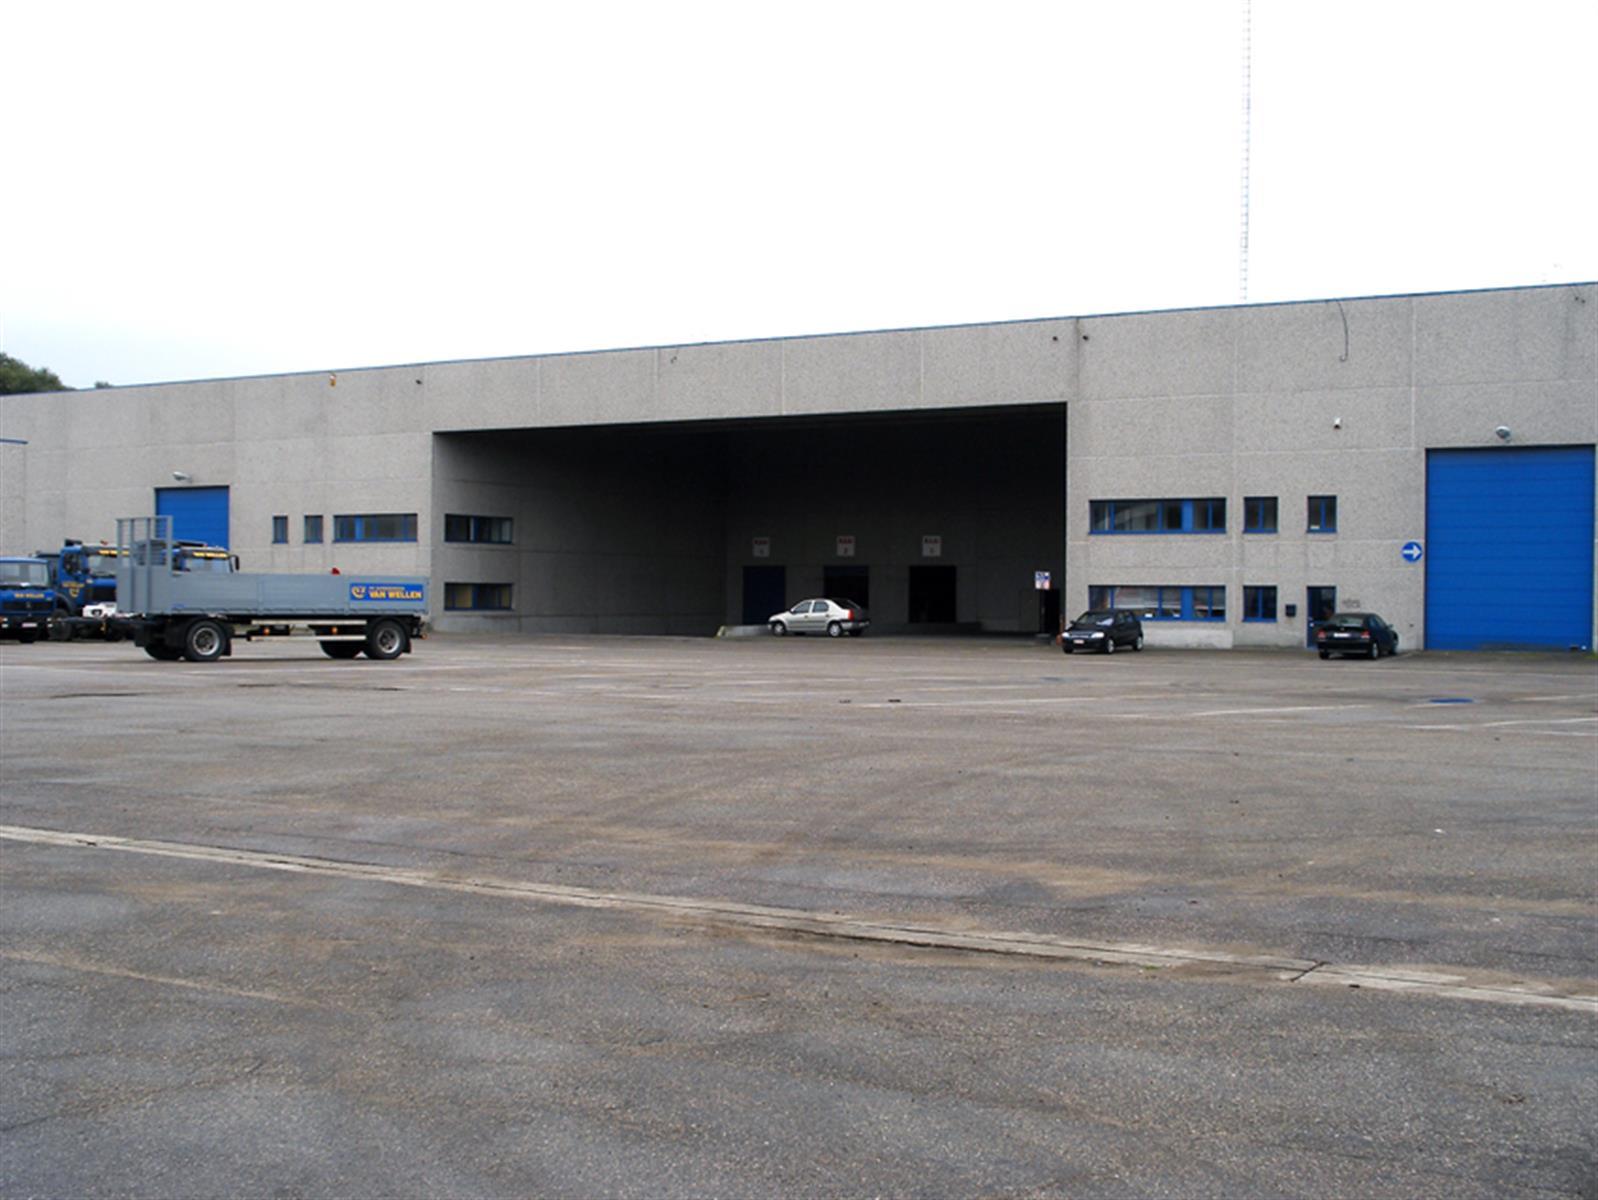 industrieel gebouw te huur KMO UNIT 1620m² MEERDERE LOADING DOCKS te KAPELLEN (B002) 1640m² - 2950 Kapellen, België 7